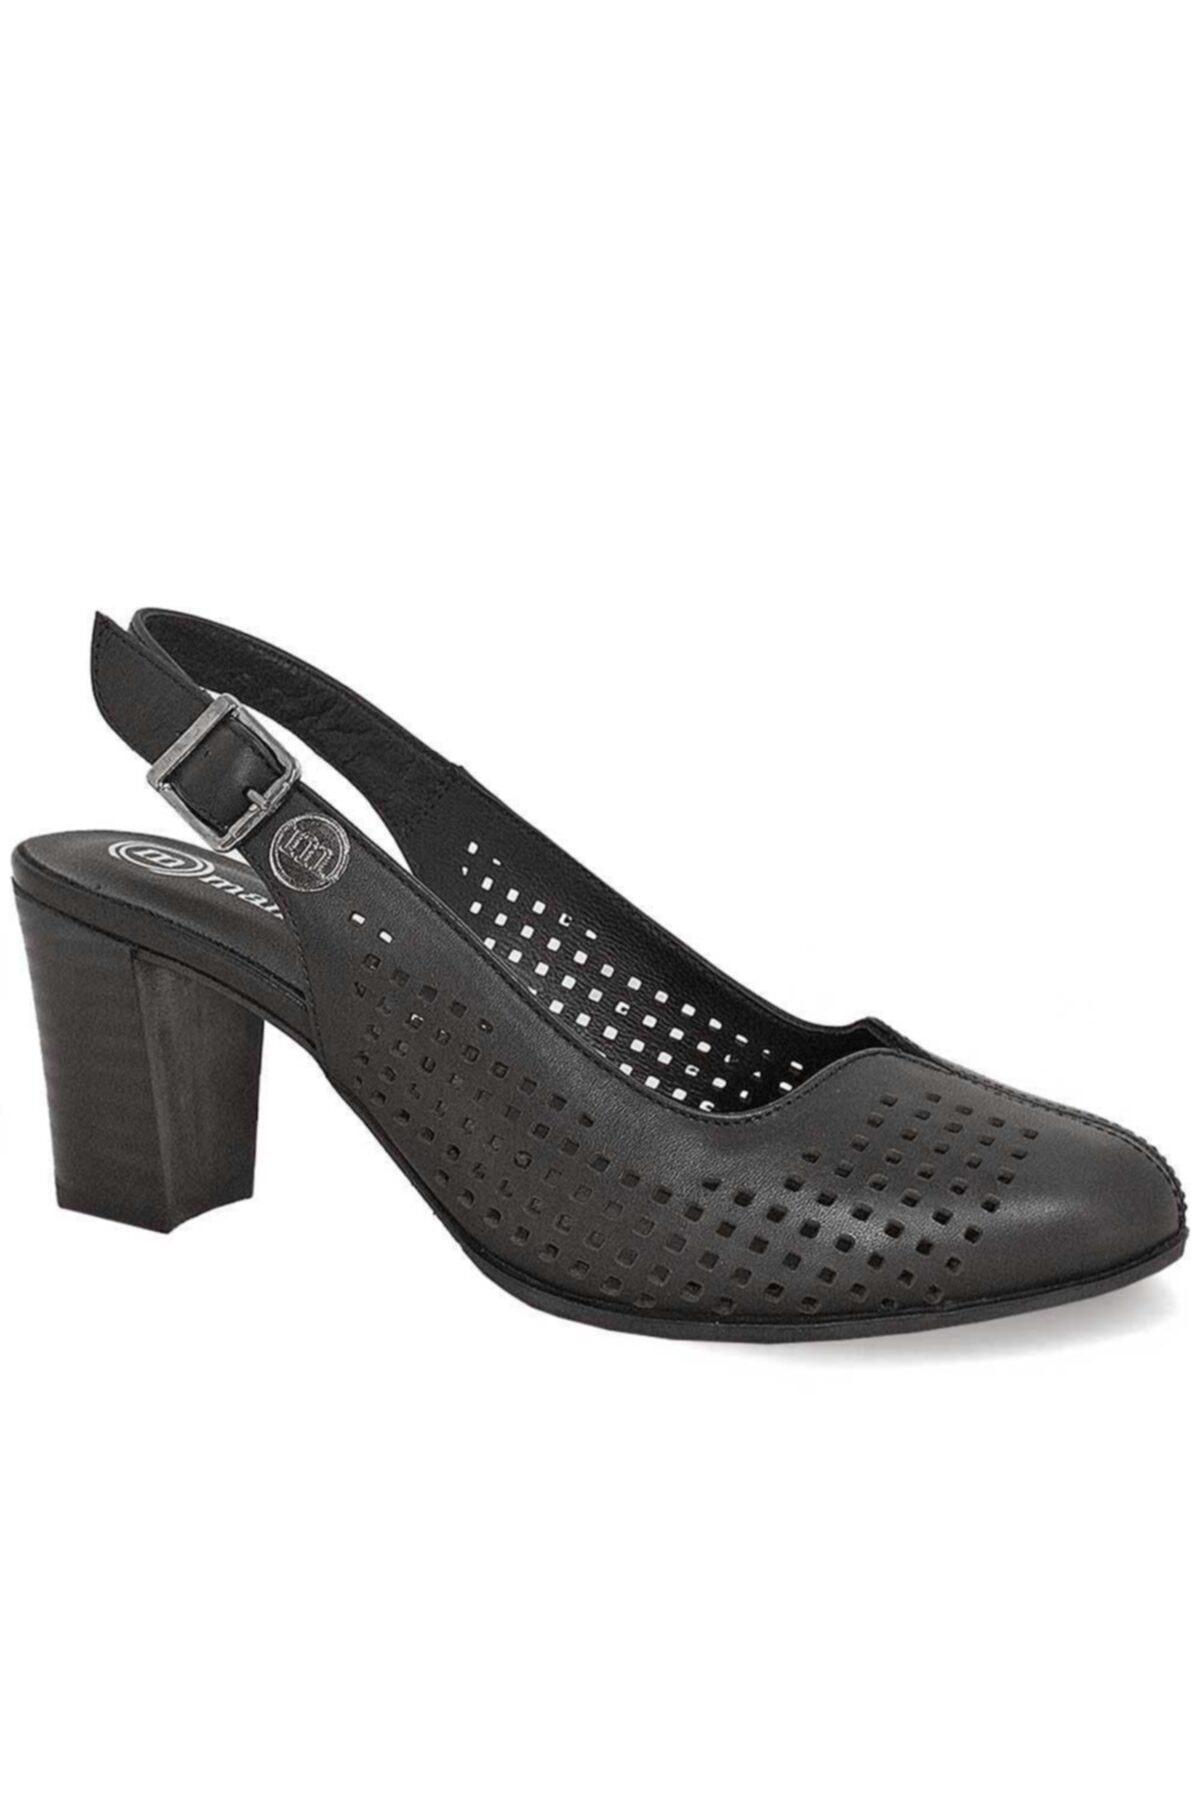 Mammamia Kadın  Topuklu Ayakkabı 1